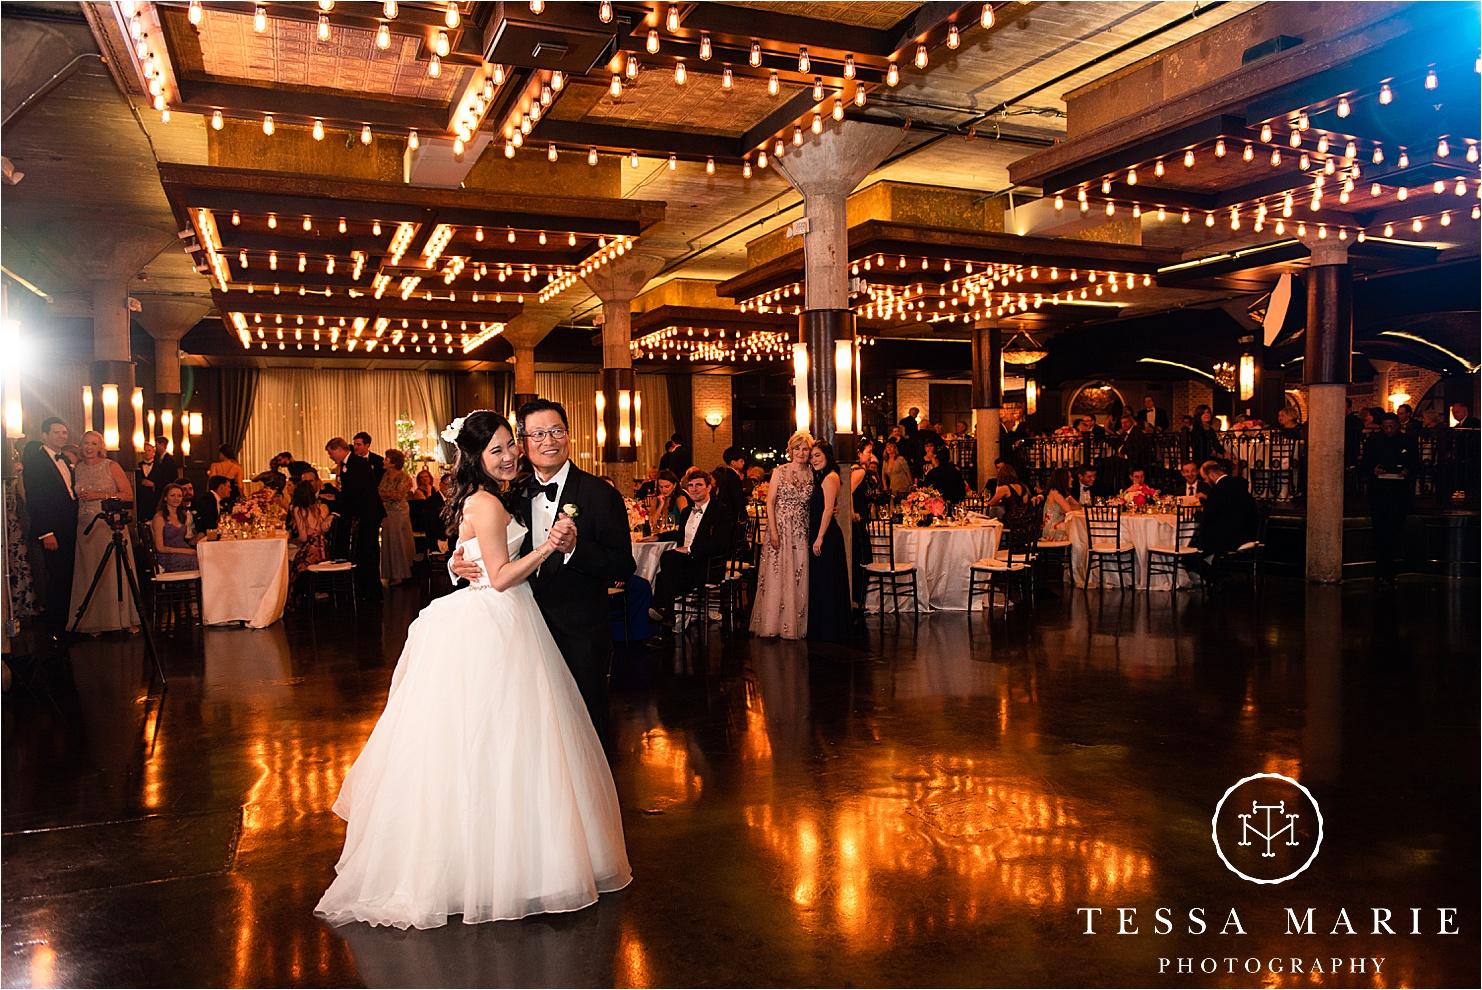 Tessa_marie_weddings_houston_wedding_photographer_The_astorian_0167.jpg